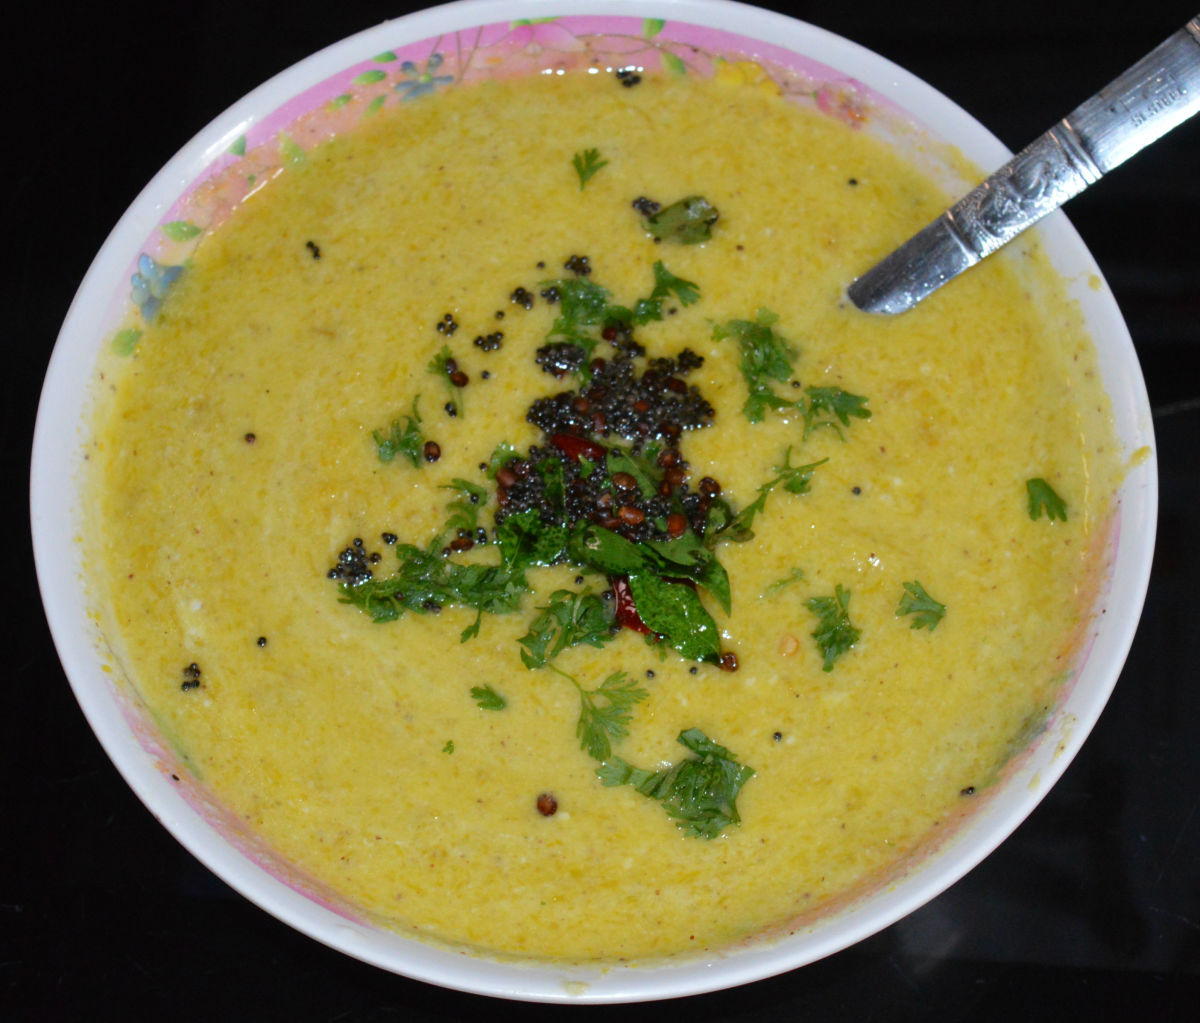 Yellow pumpkin raita is a yogurt-based side dish